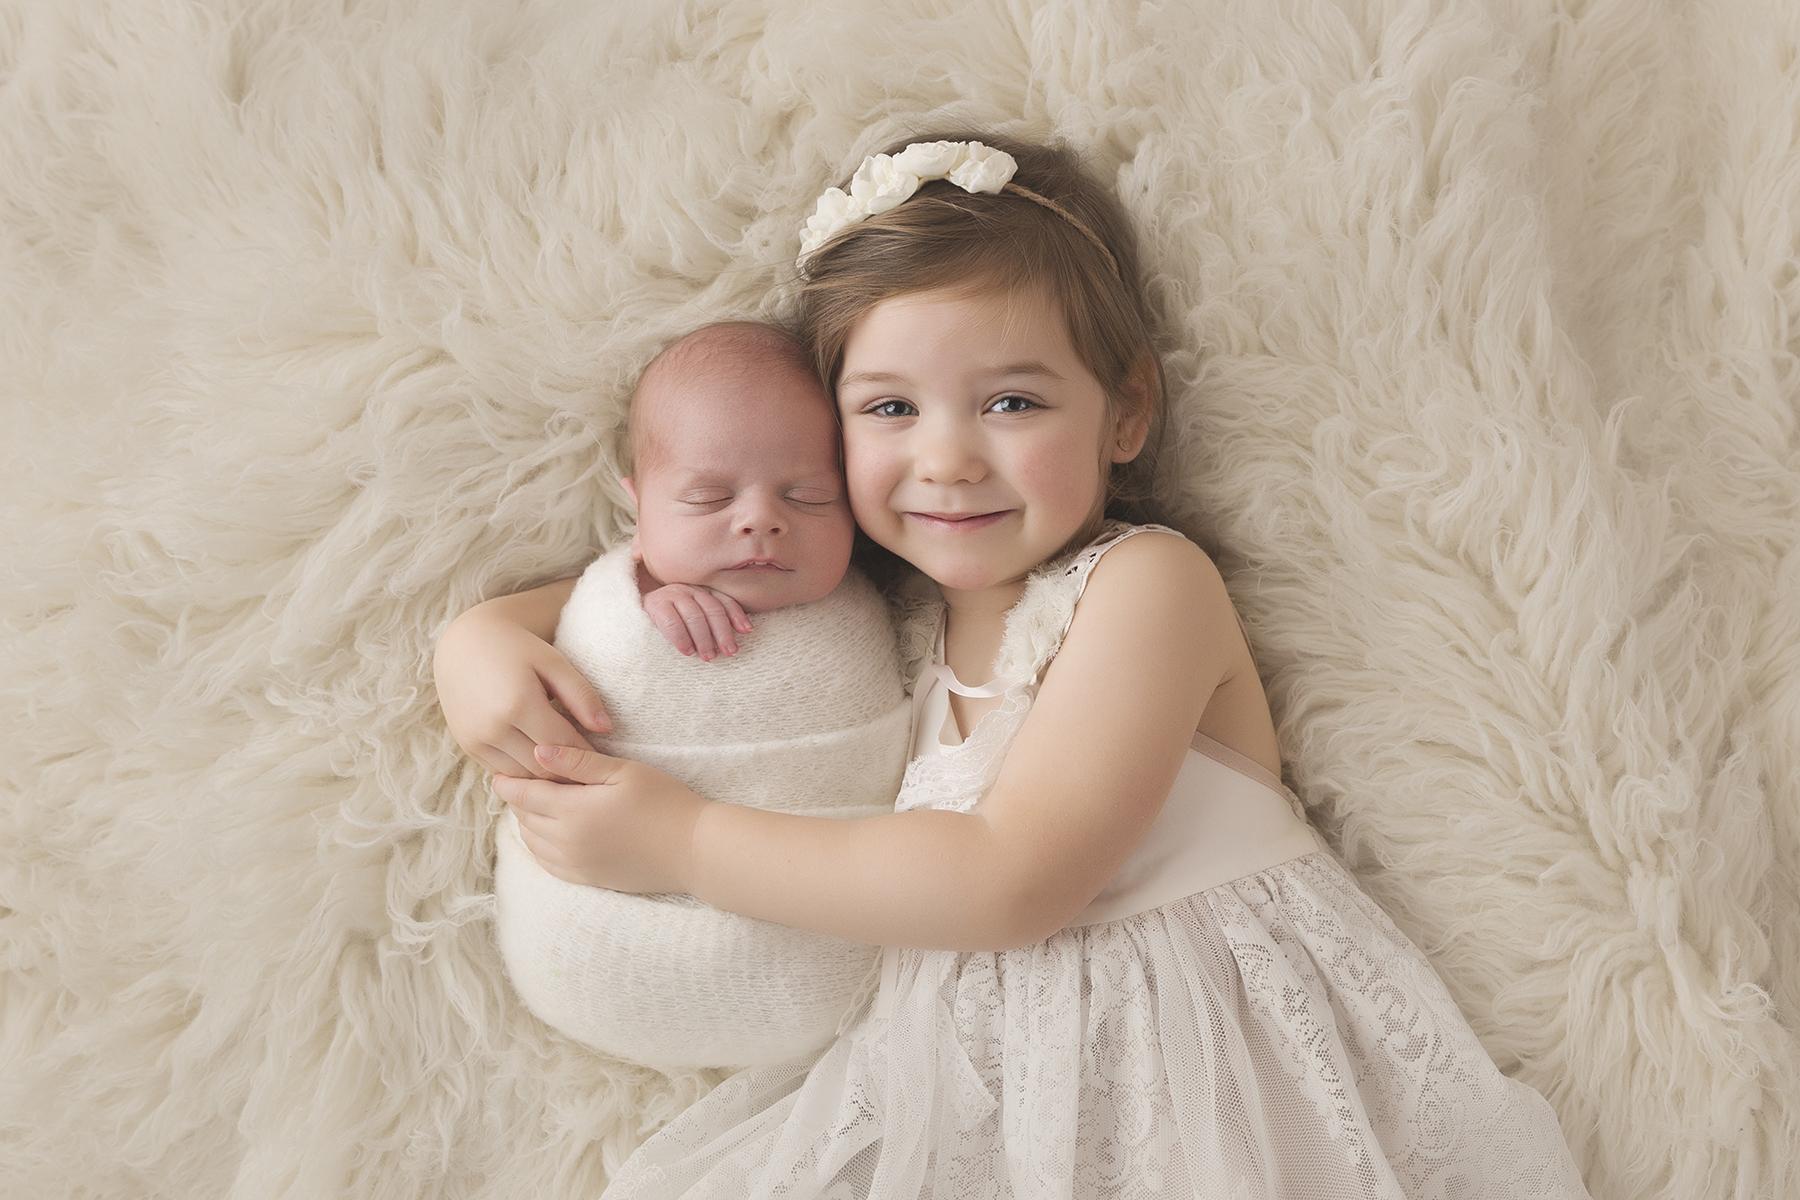 melborne newborn pgotography